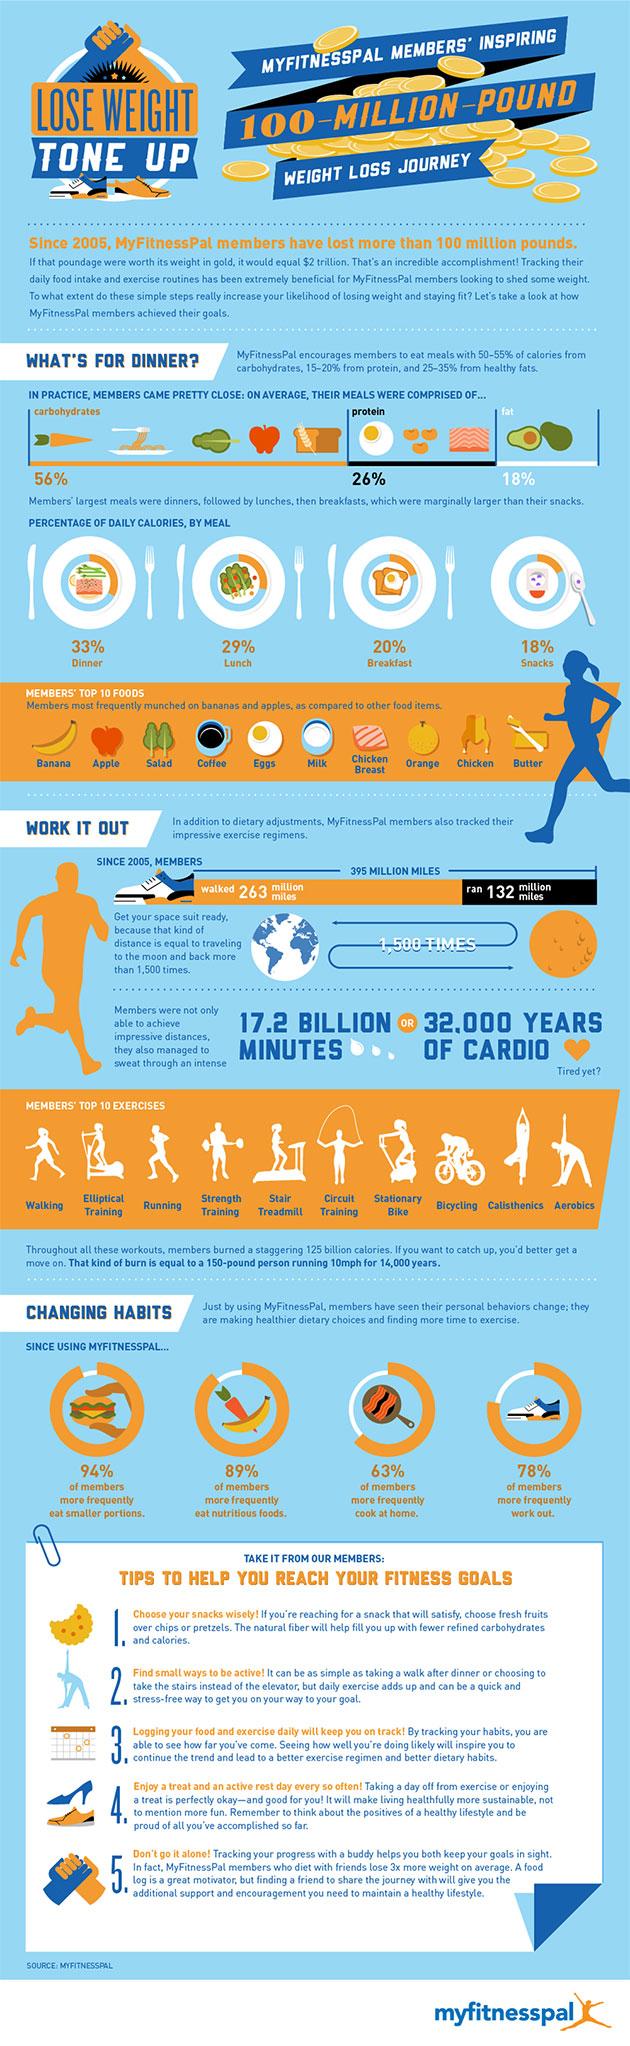 MyFItnessPal App Infographic